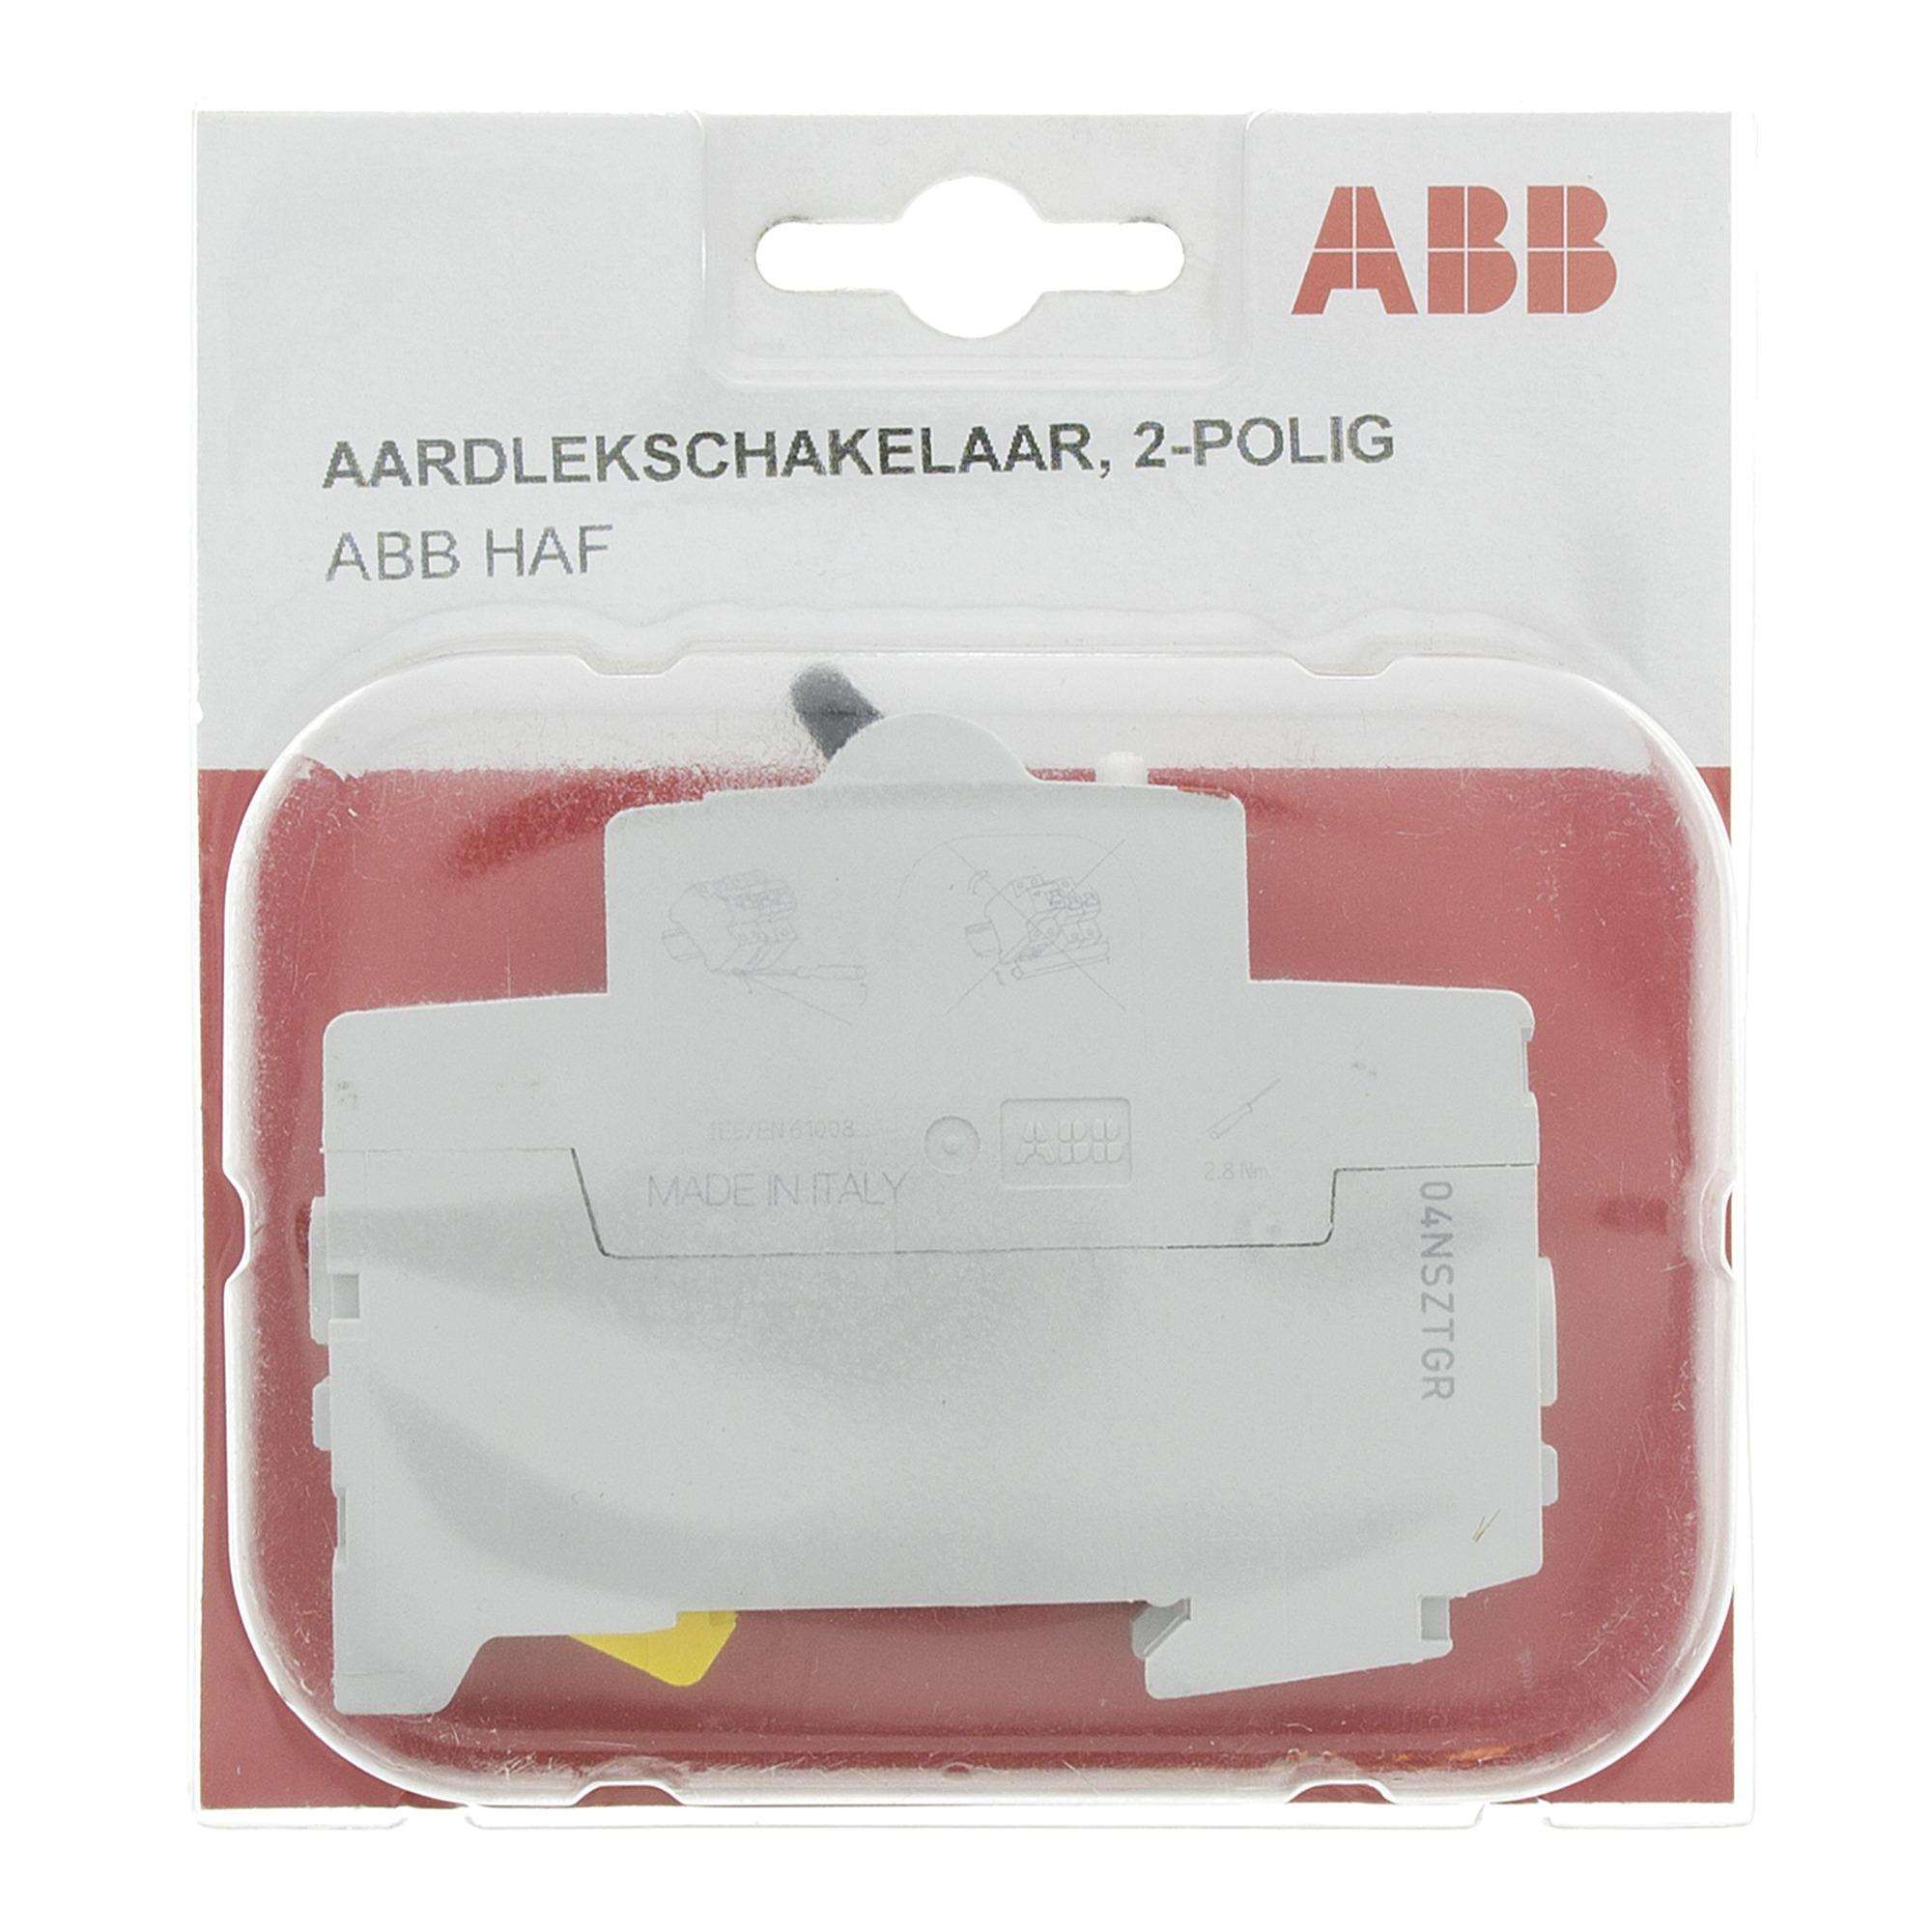 ABB HAF aardlekschakelaar 2-polig 40A in blister